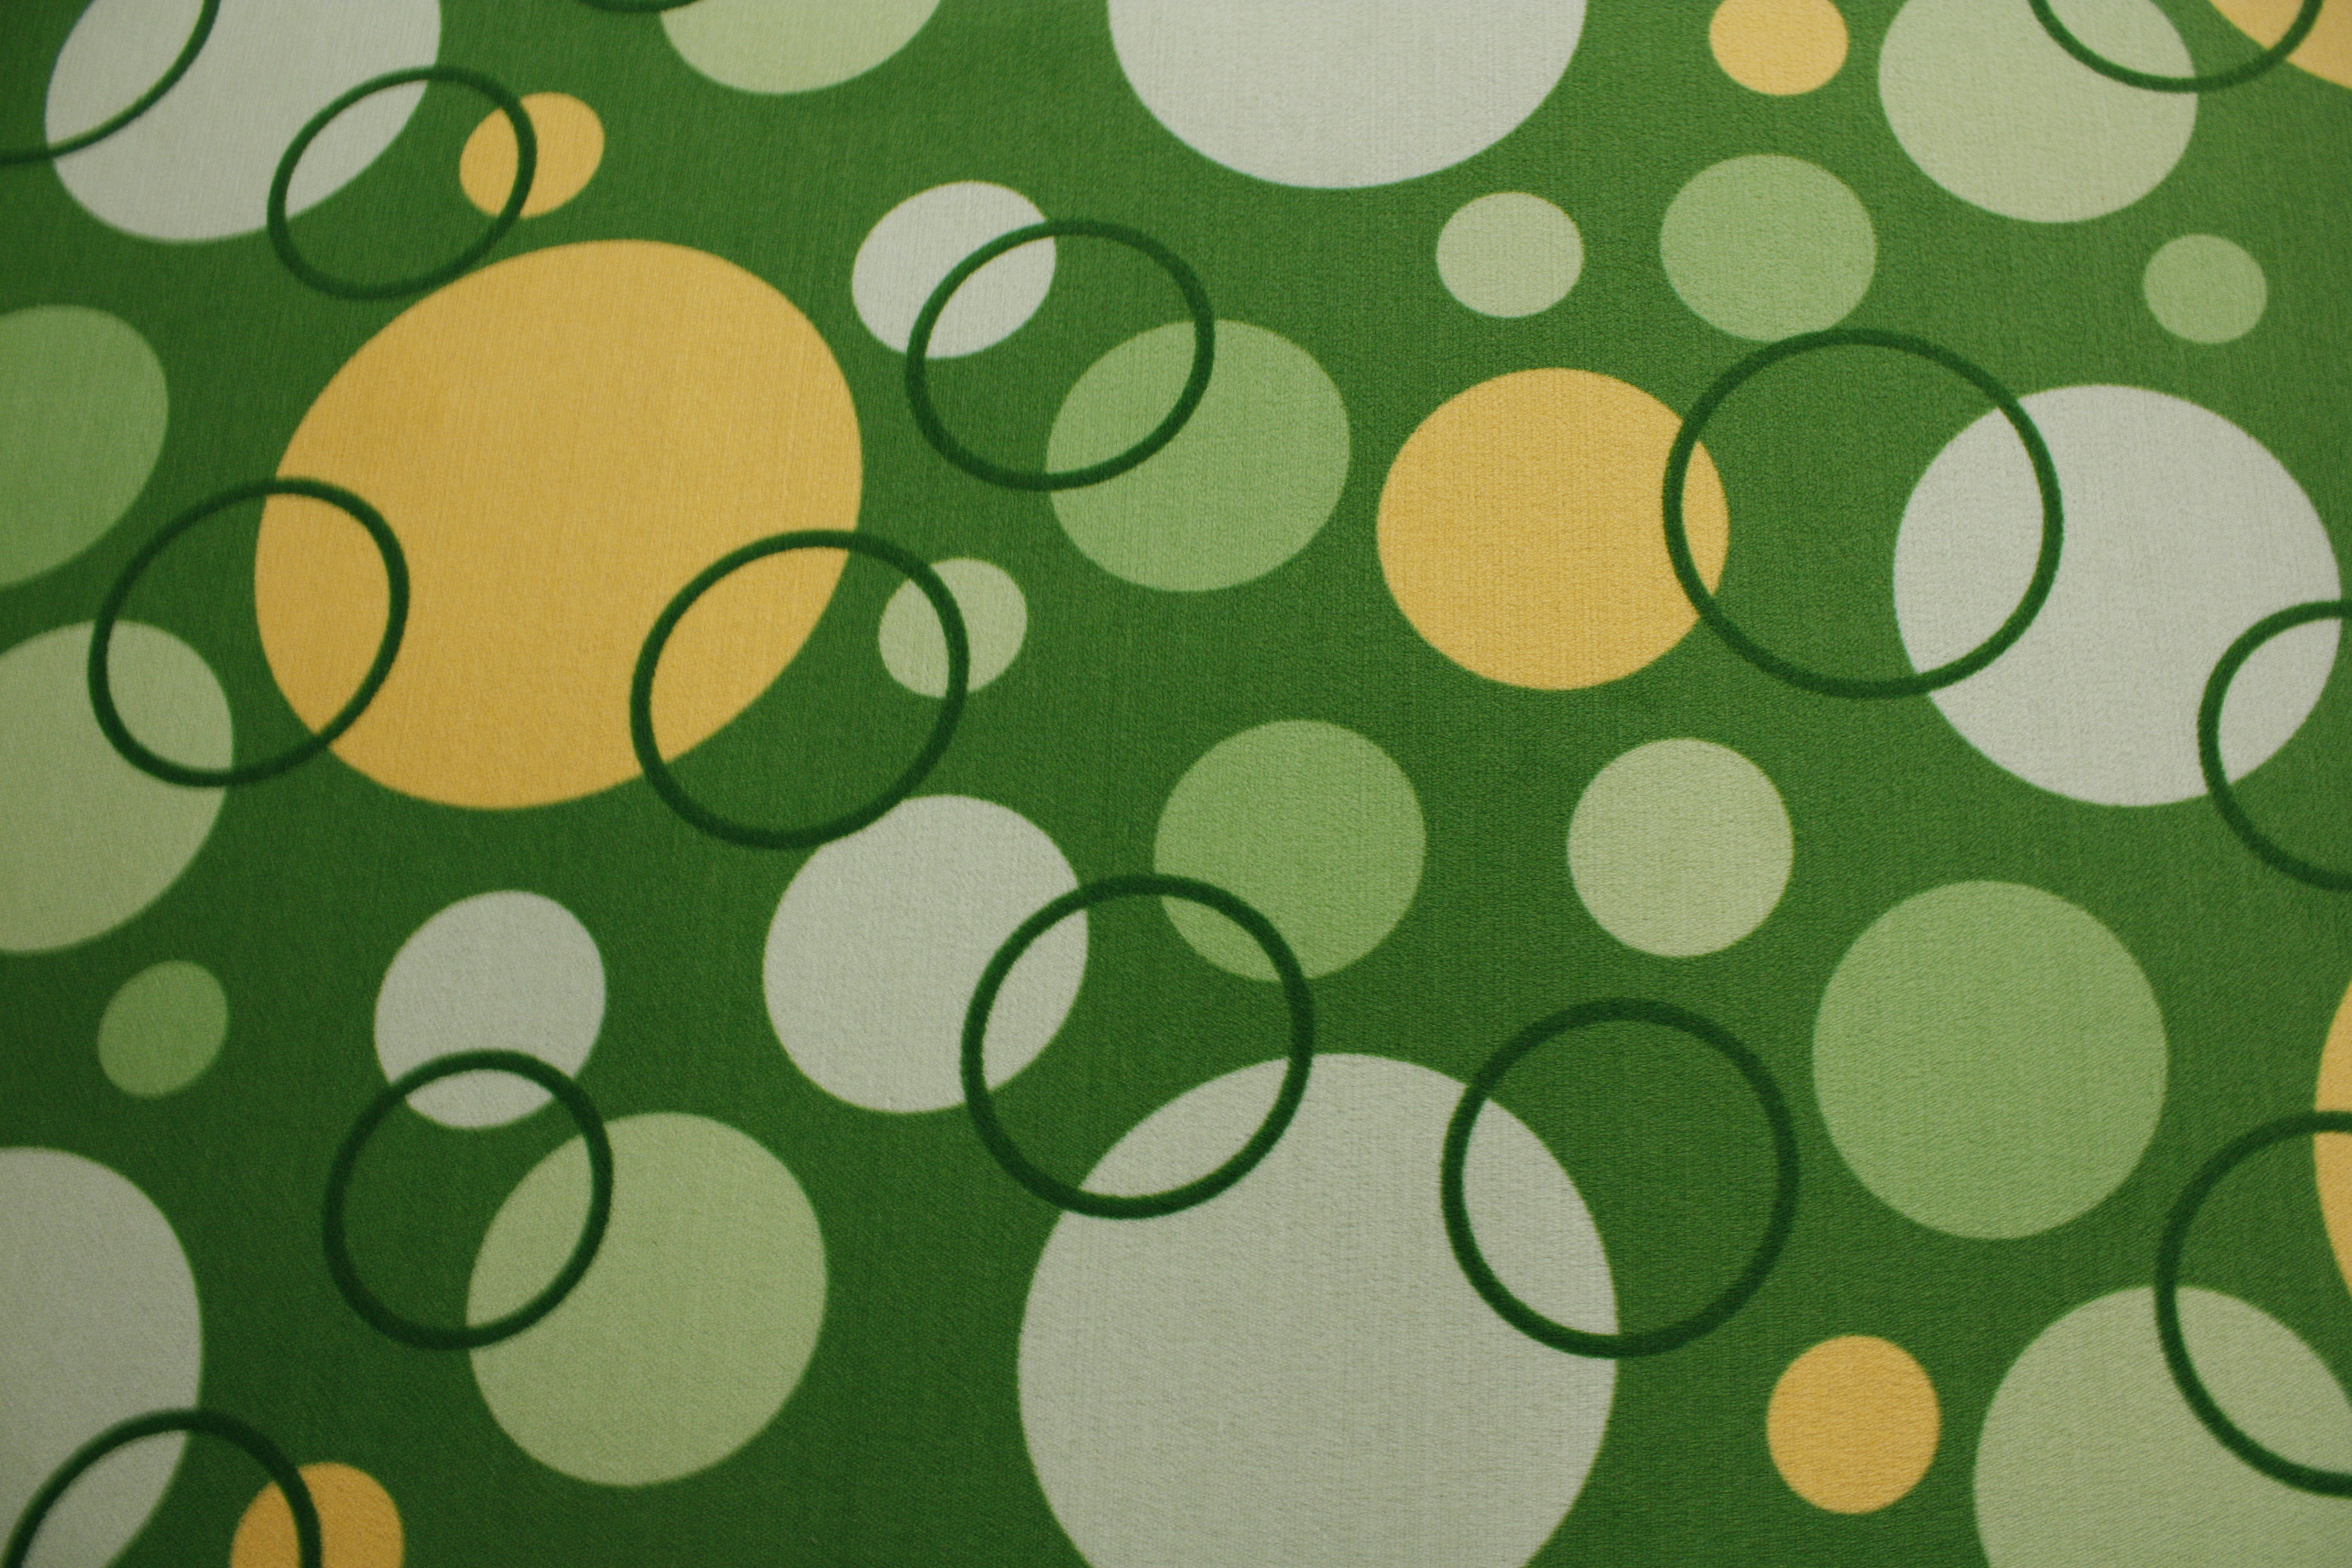 Kinder Rug Play carpet Circle green 400x250cm  eBay